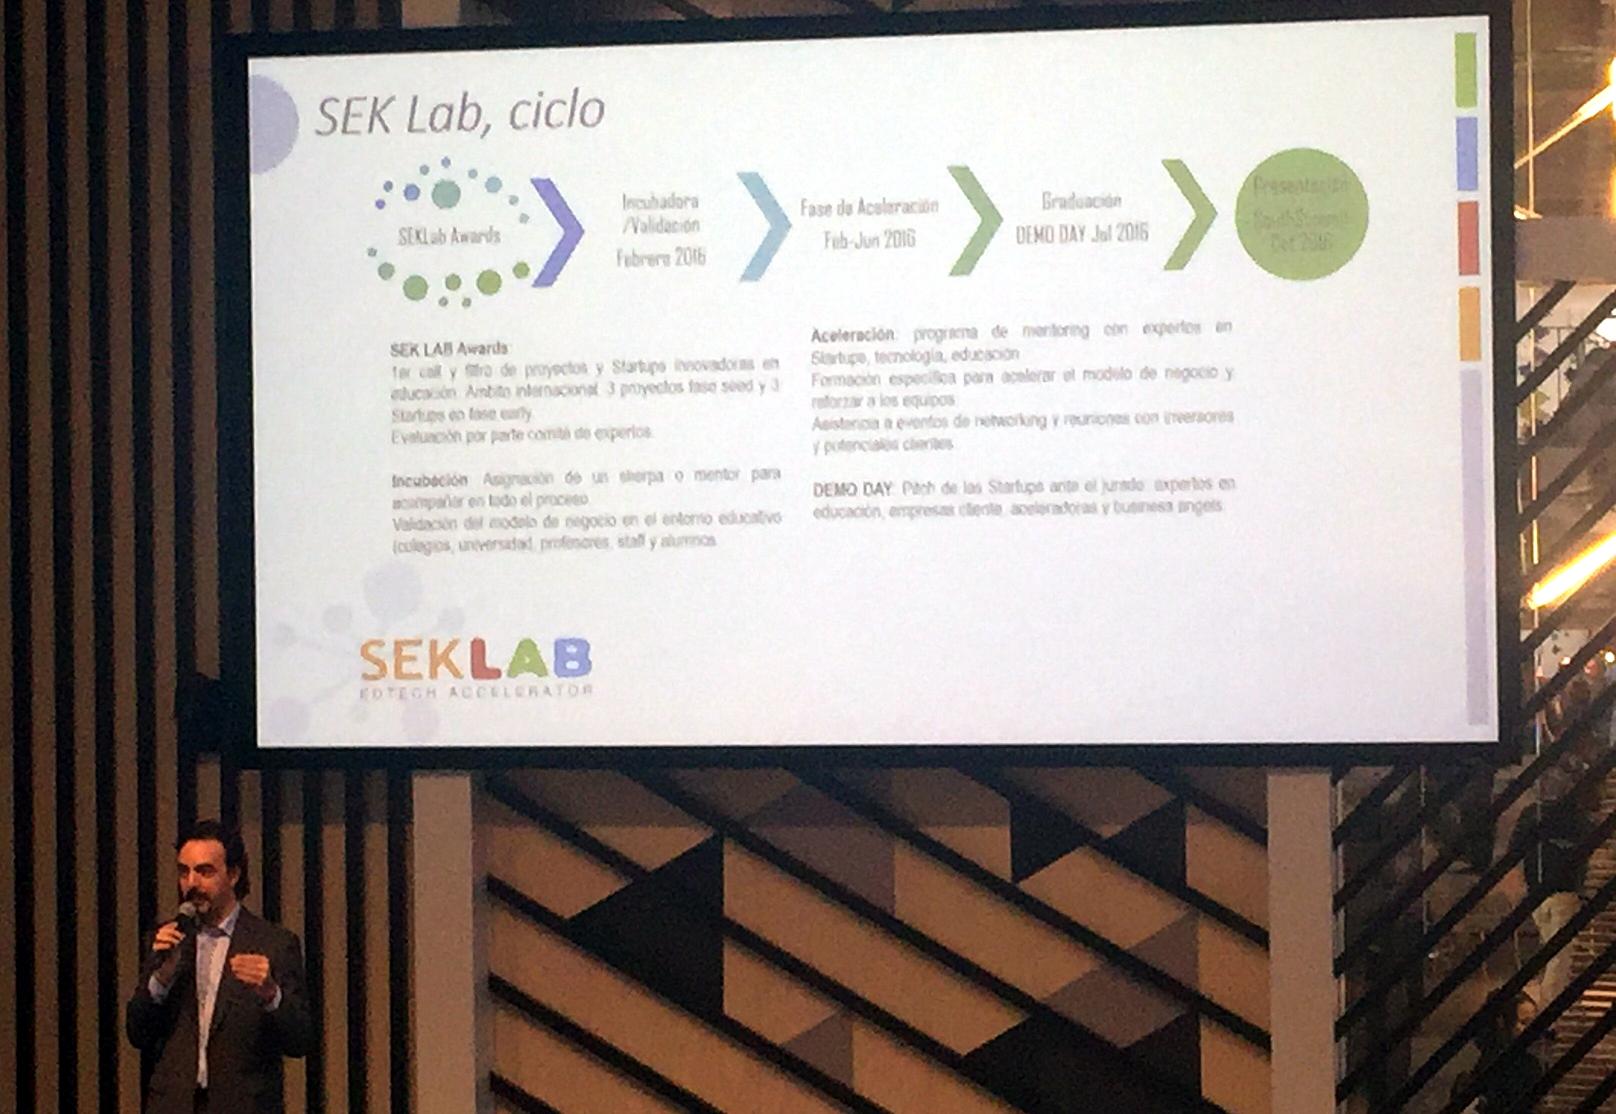 sek-lab-ciclo